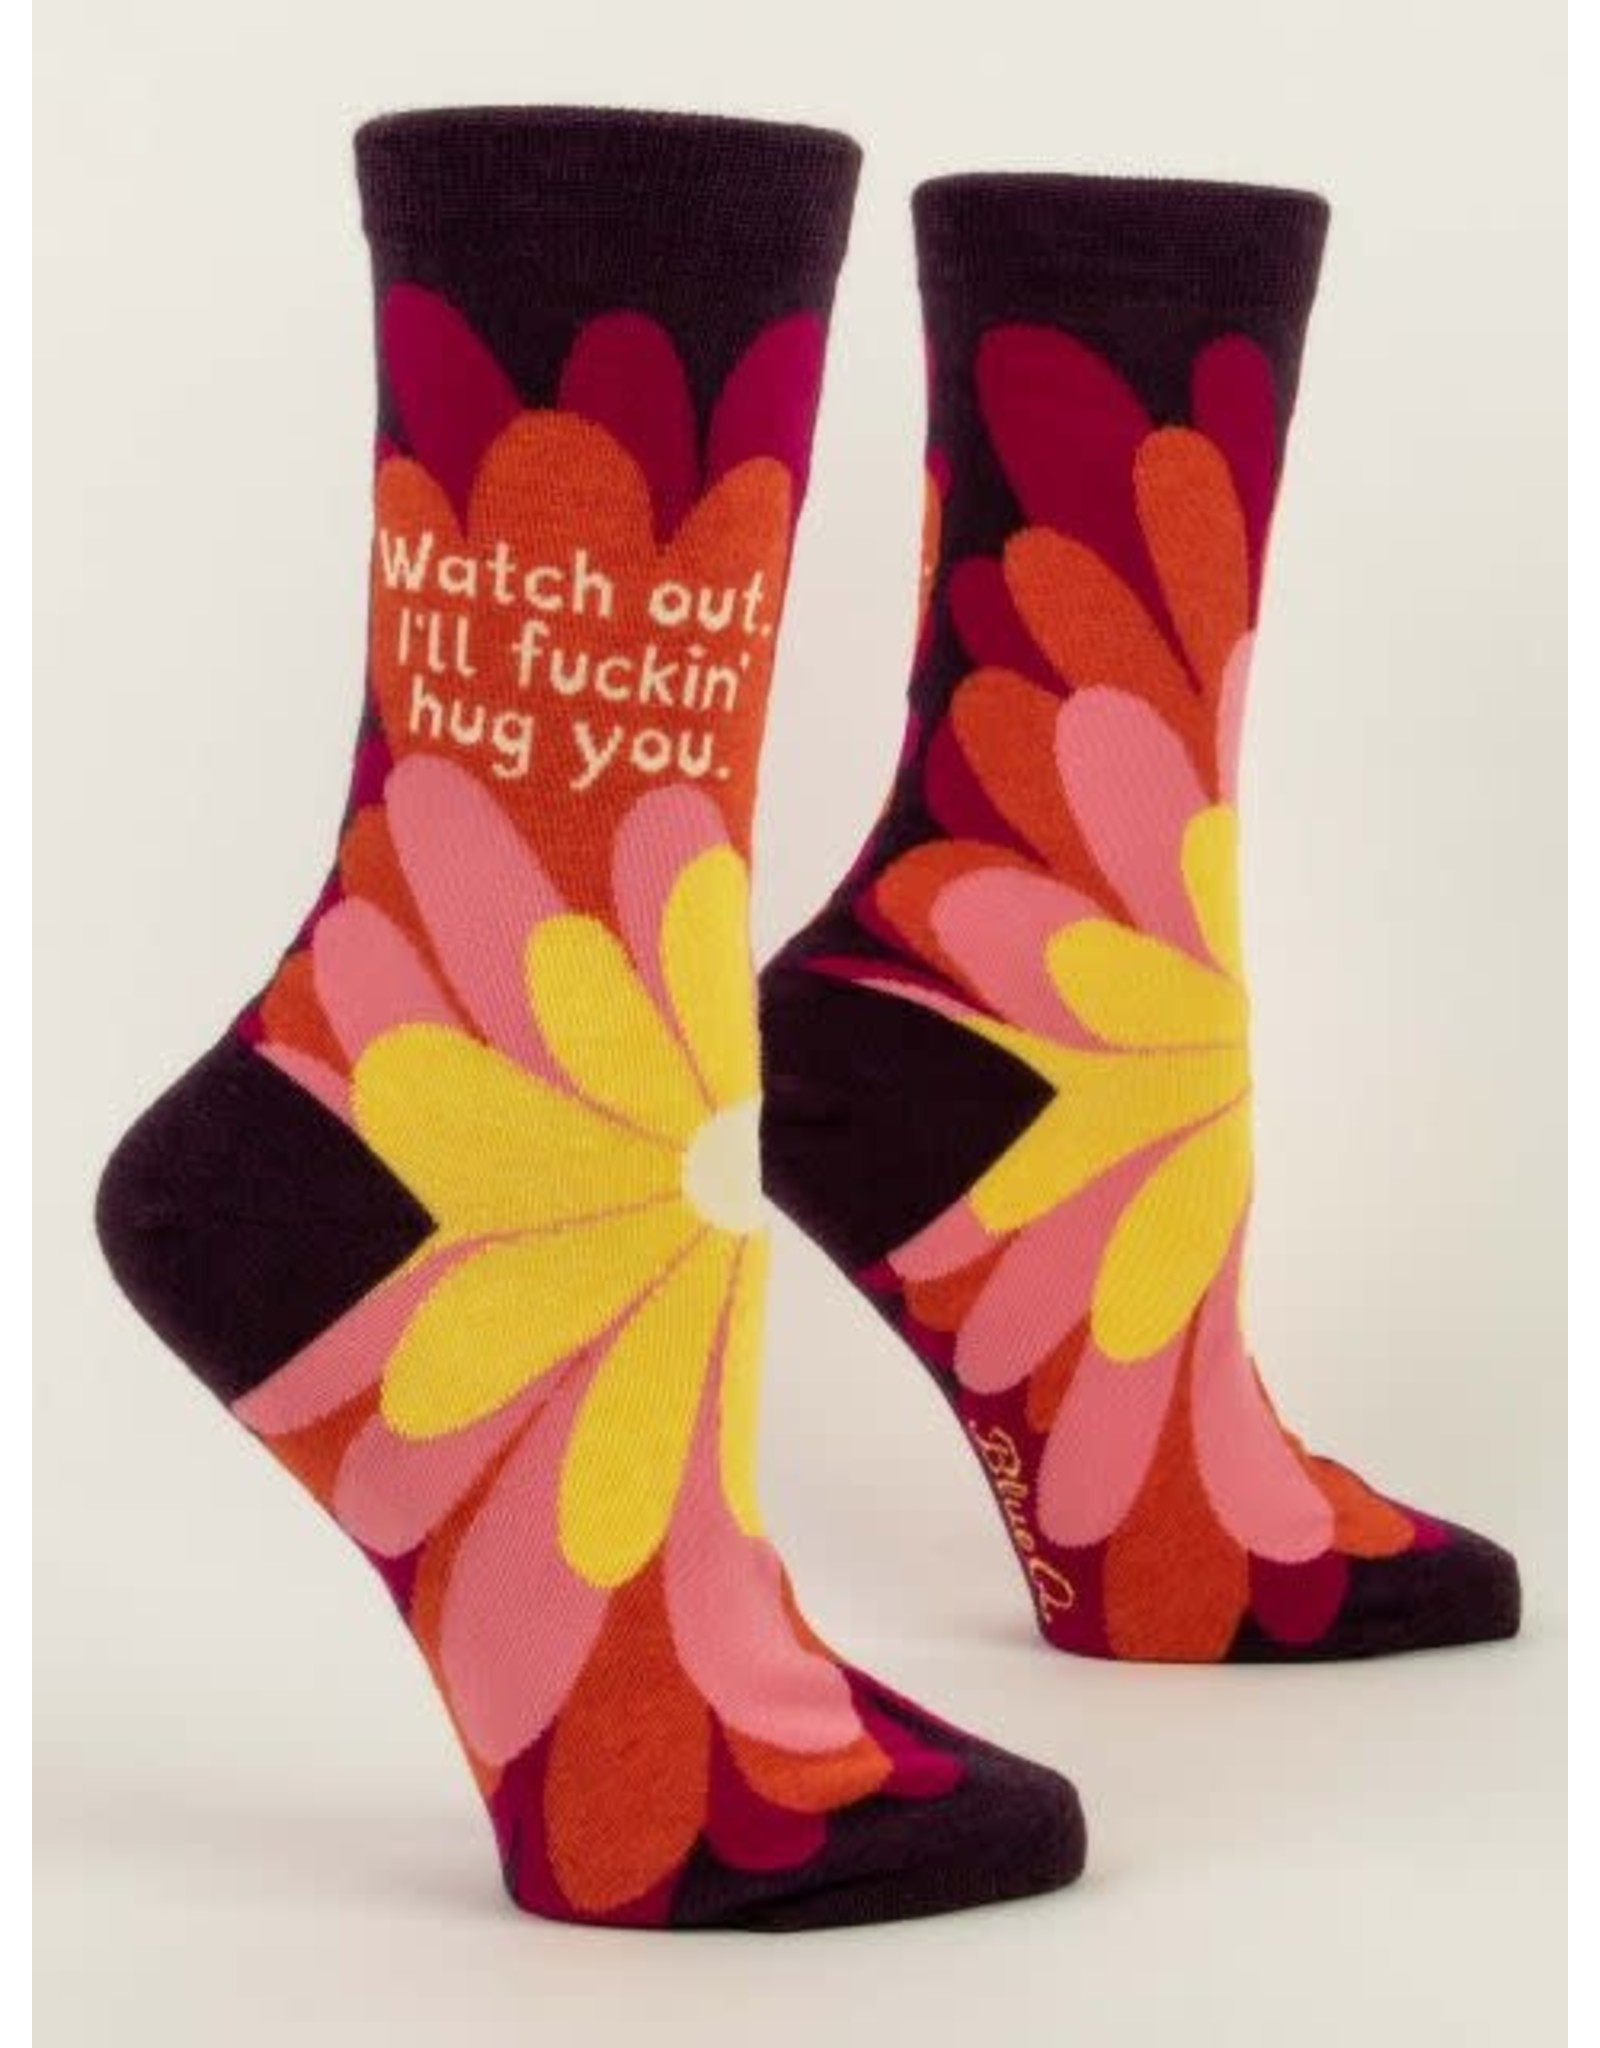 Socks (Womens) - Watch Out, I'll Fucking Hug You